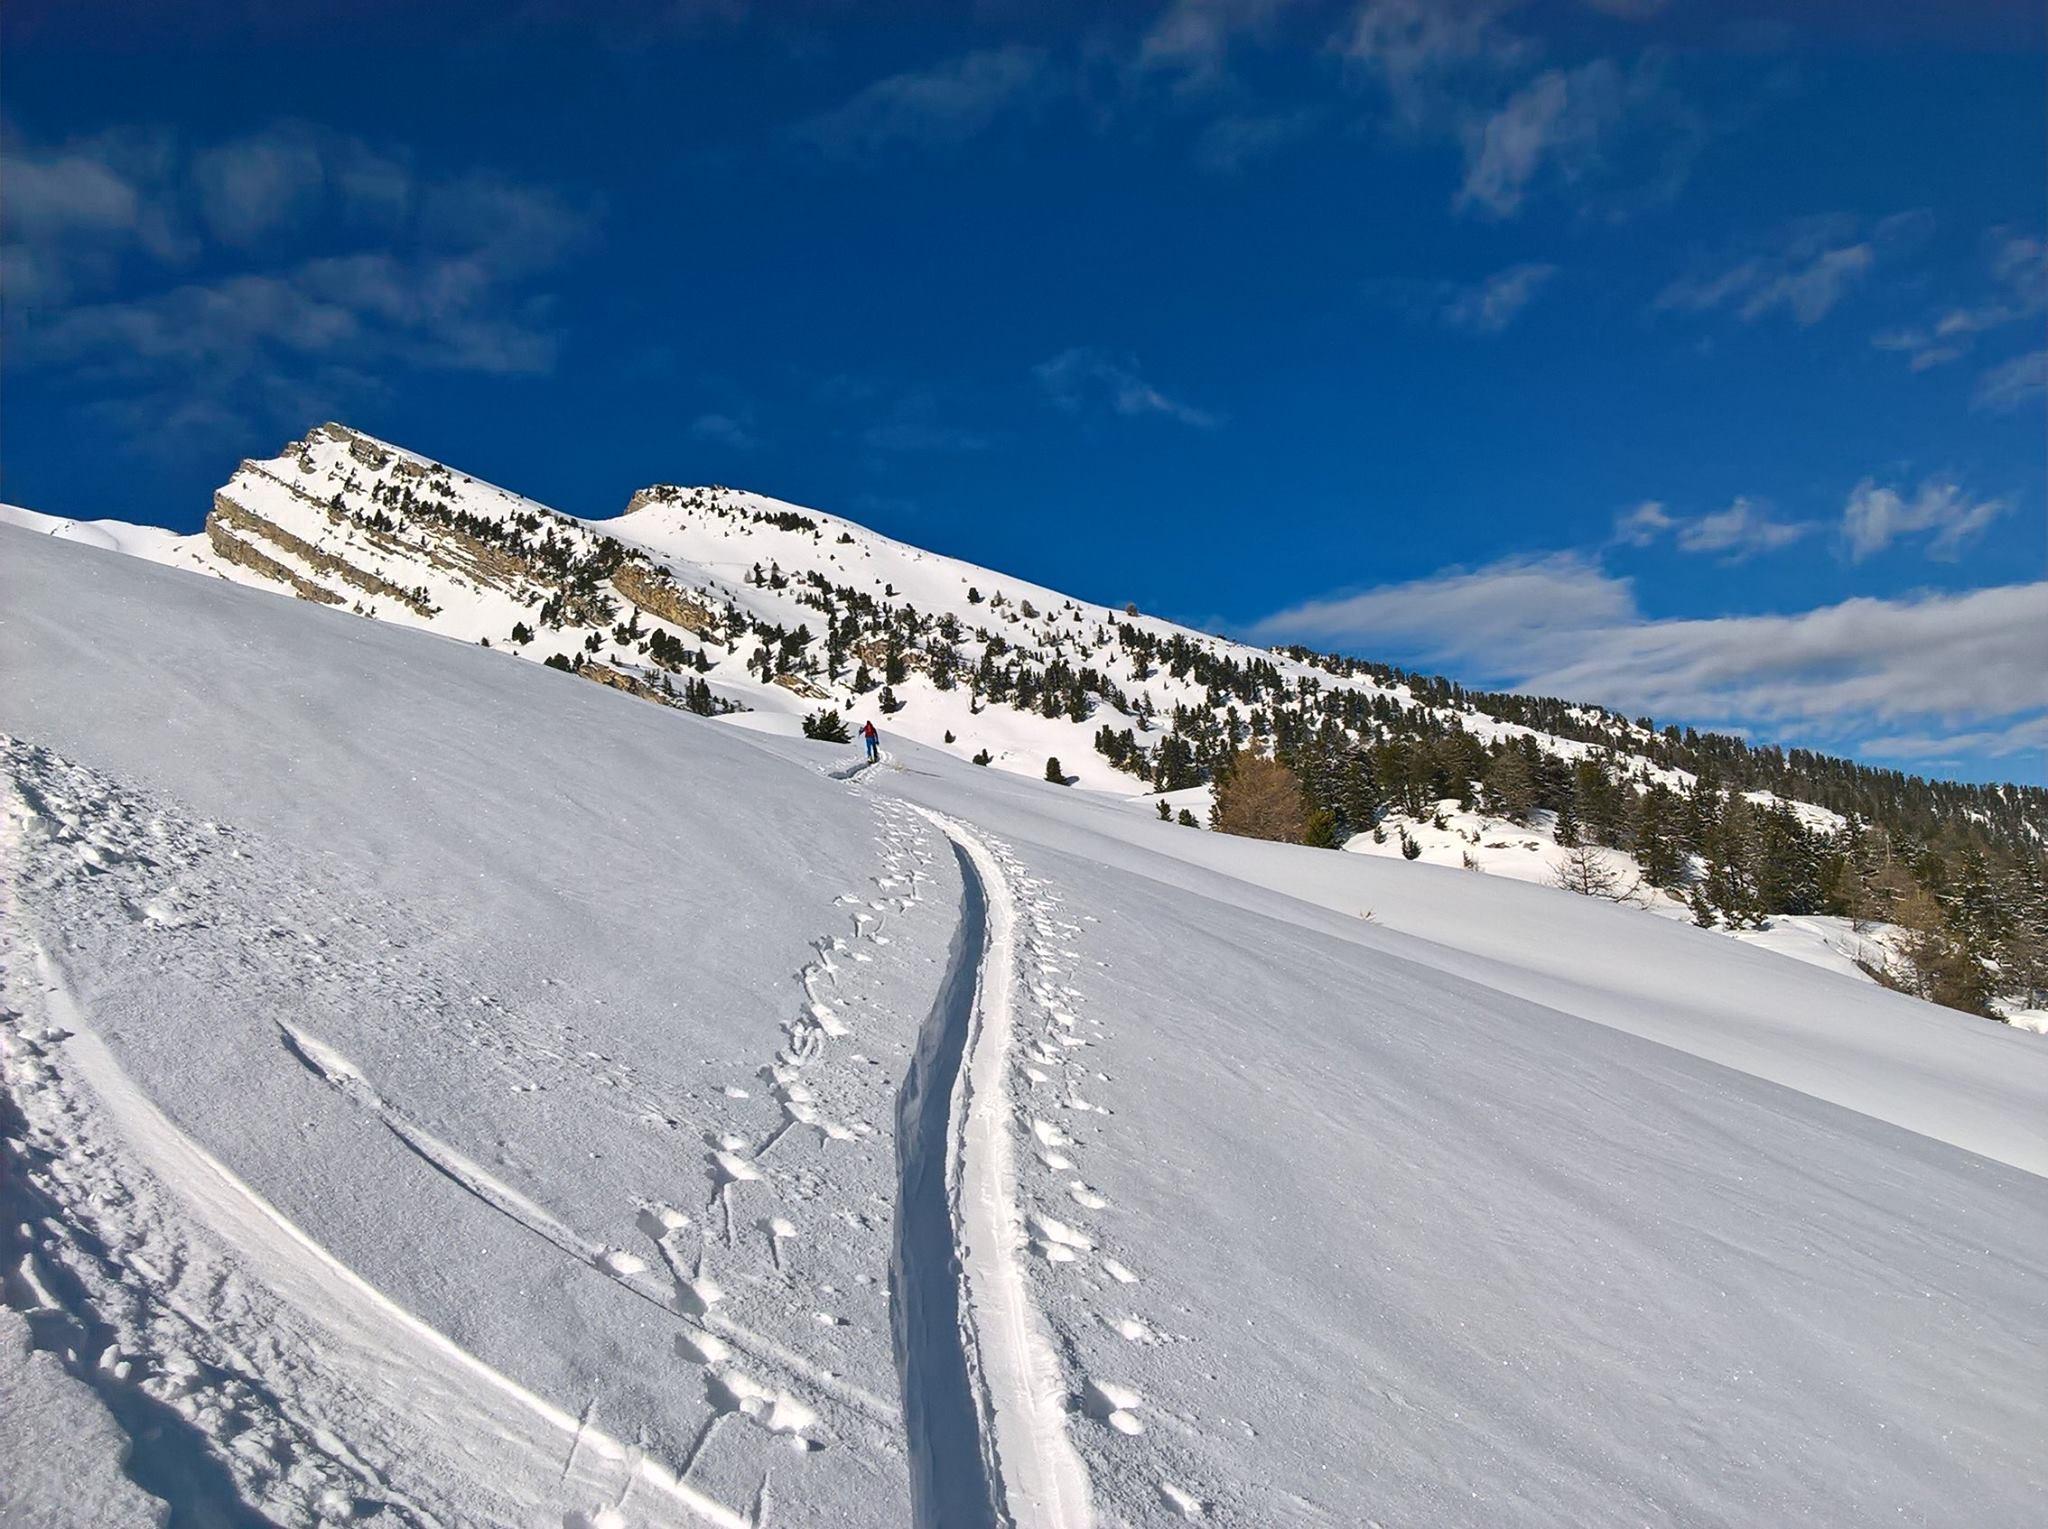 y a de la neige en ubaye